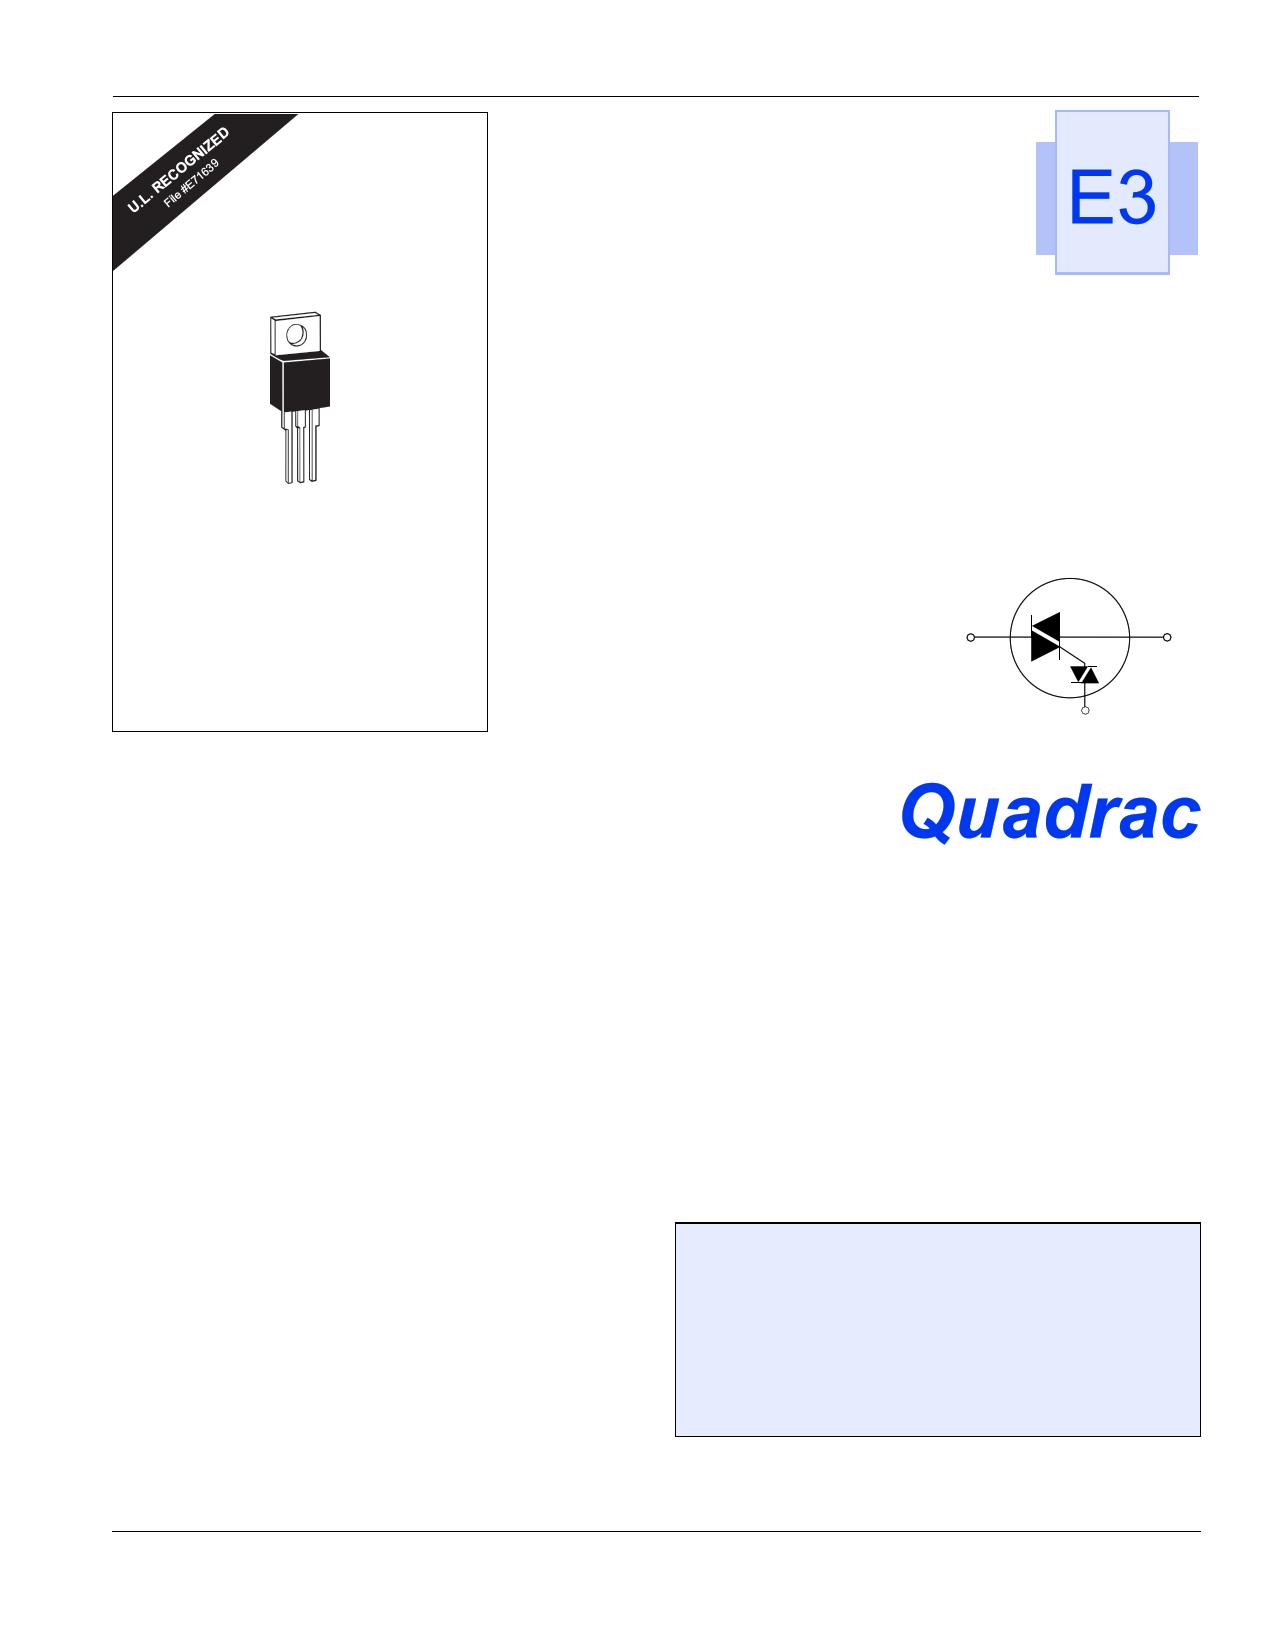 Q2010LT دیتاشیت PDF